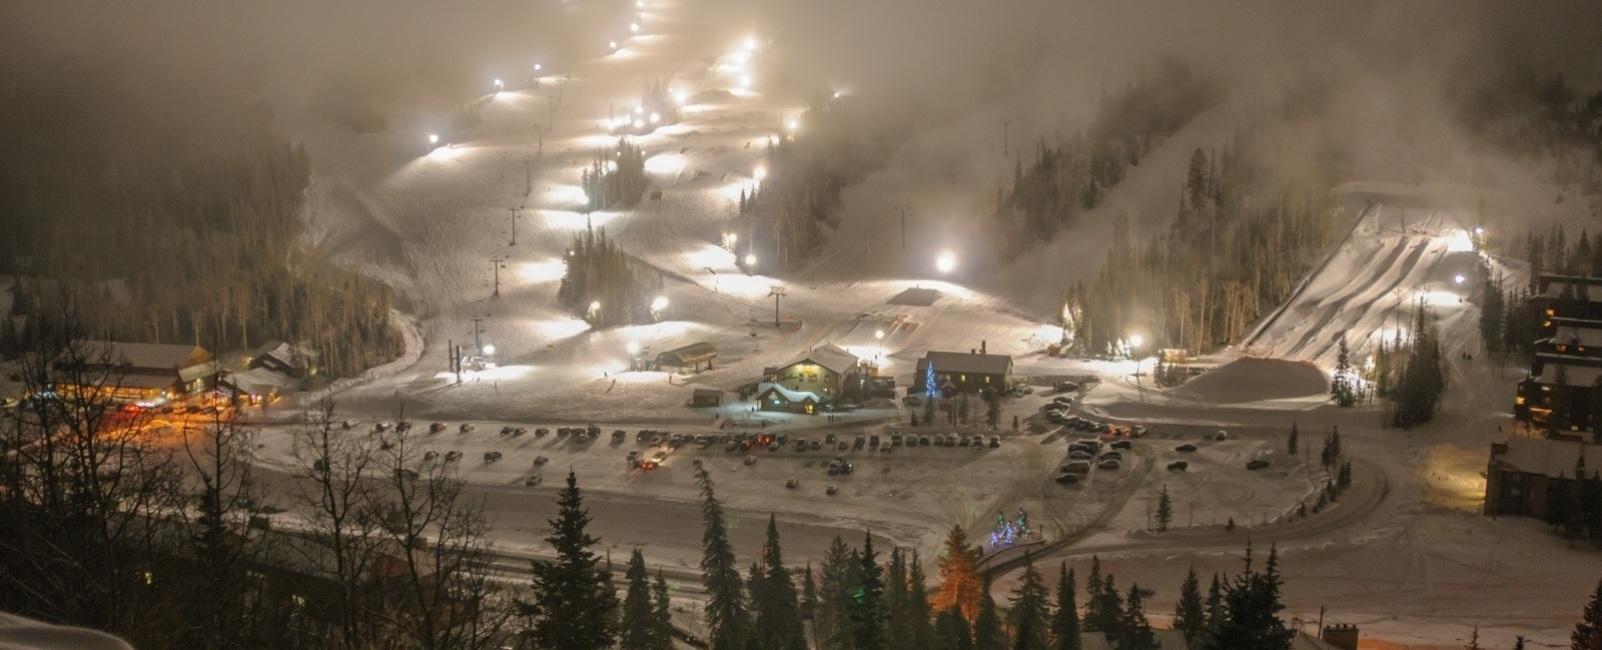 Night Skiing in Utah